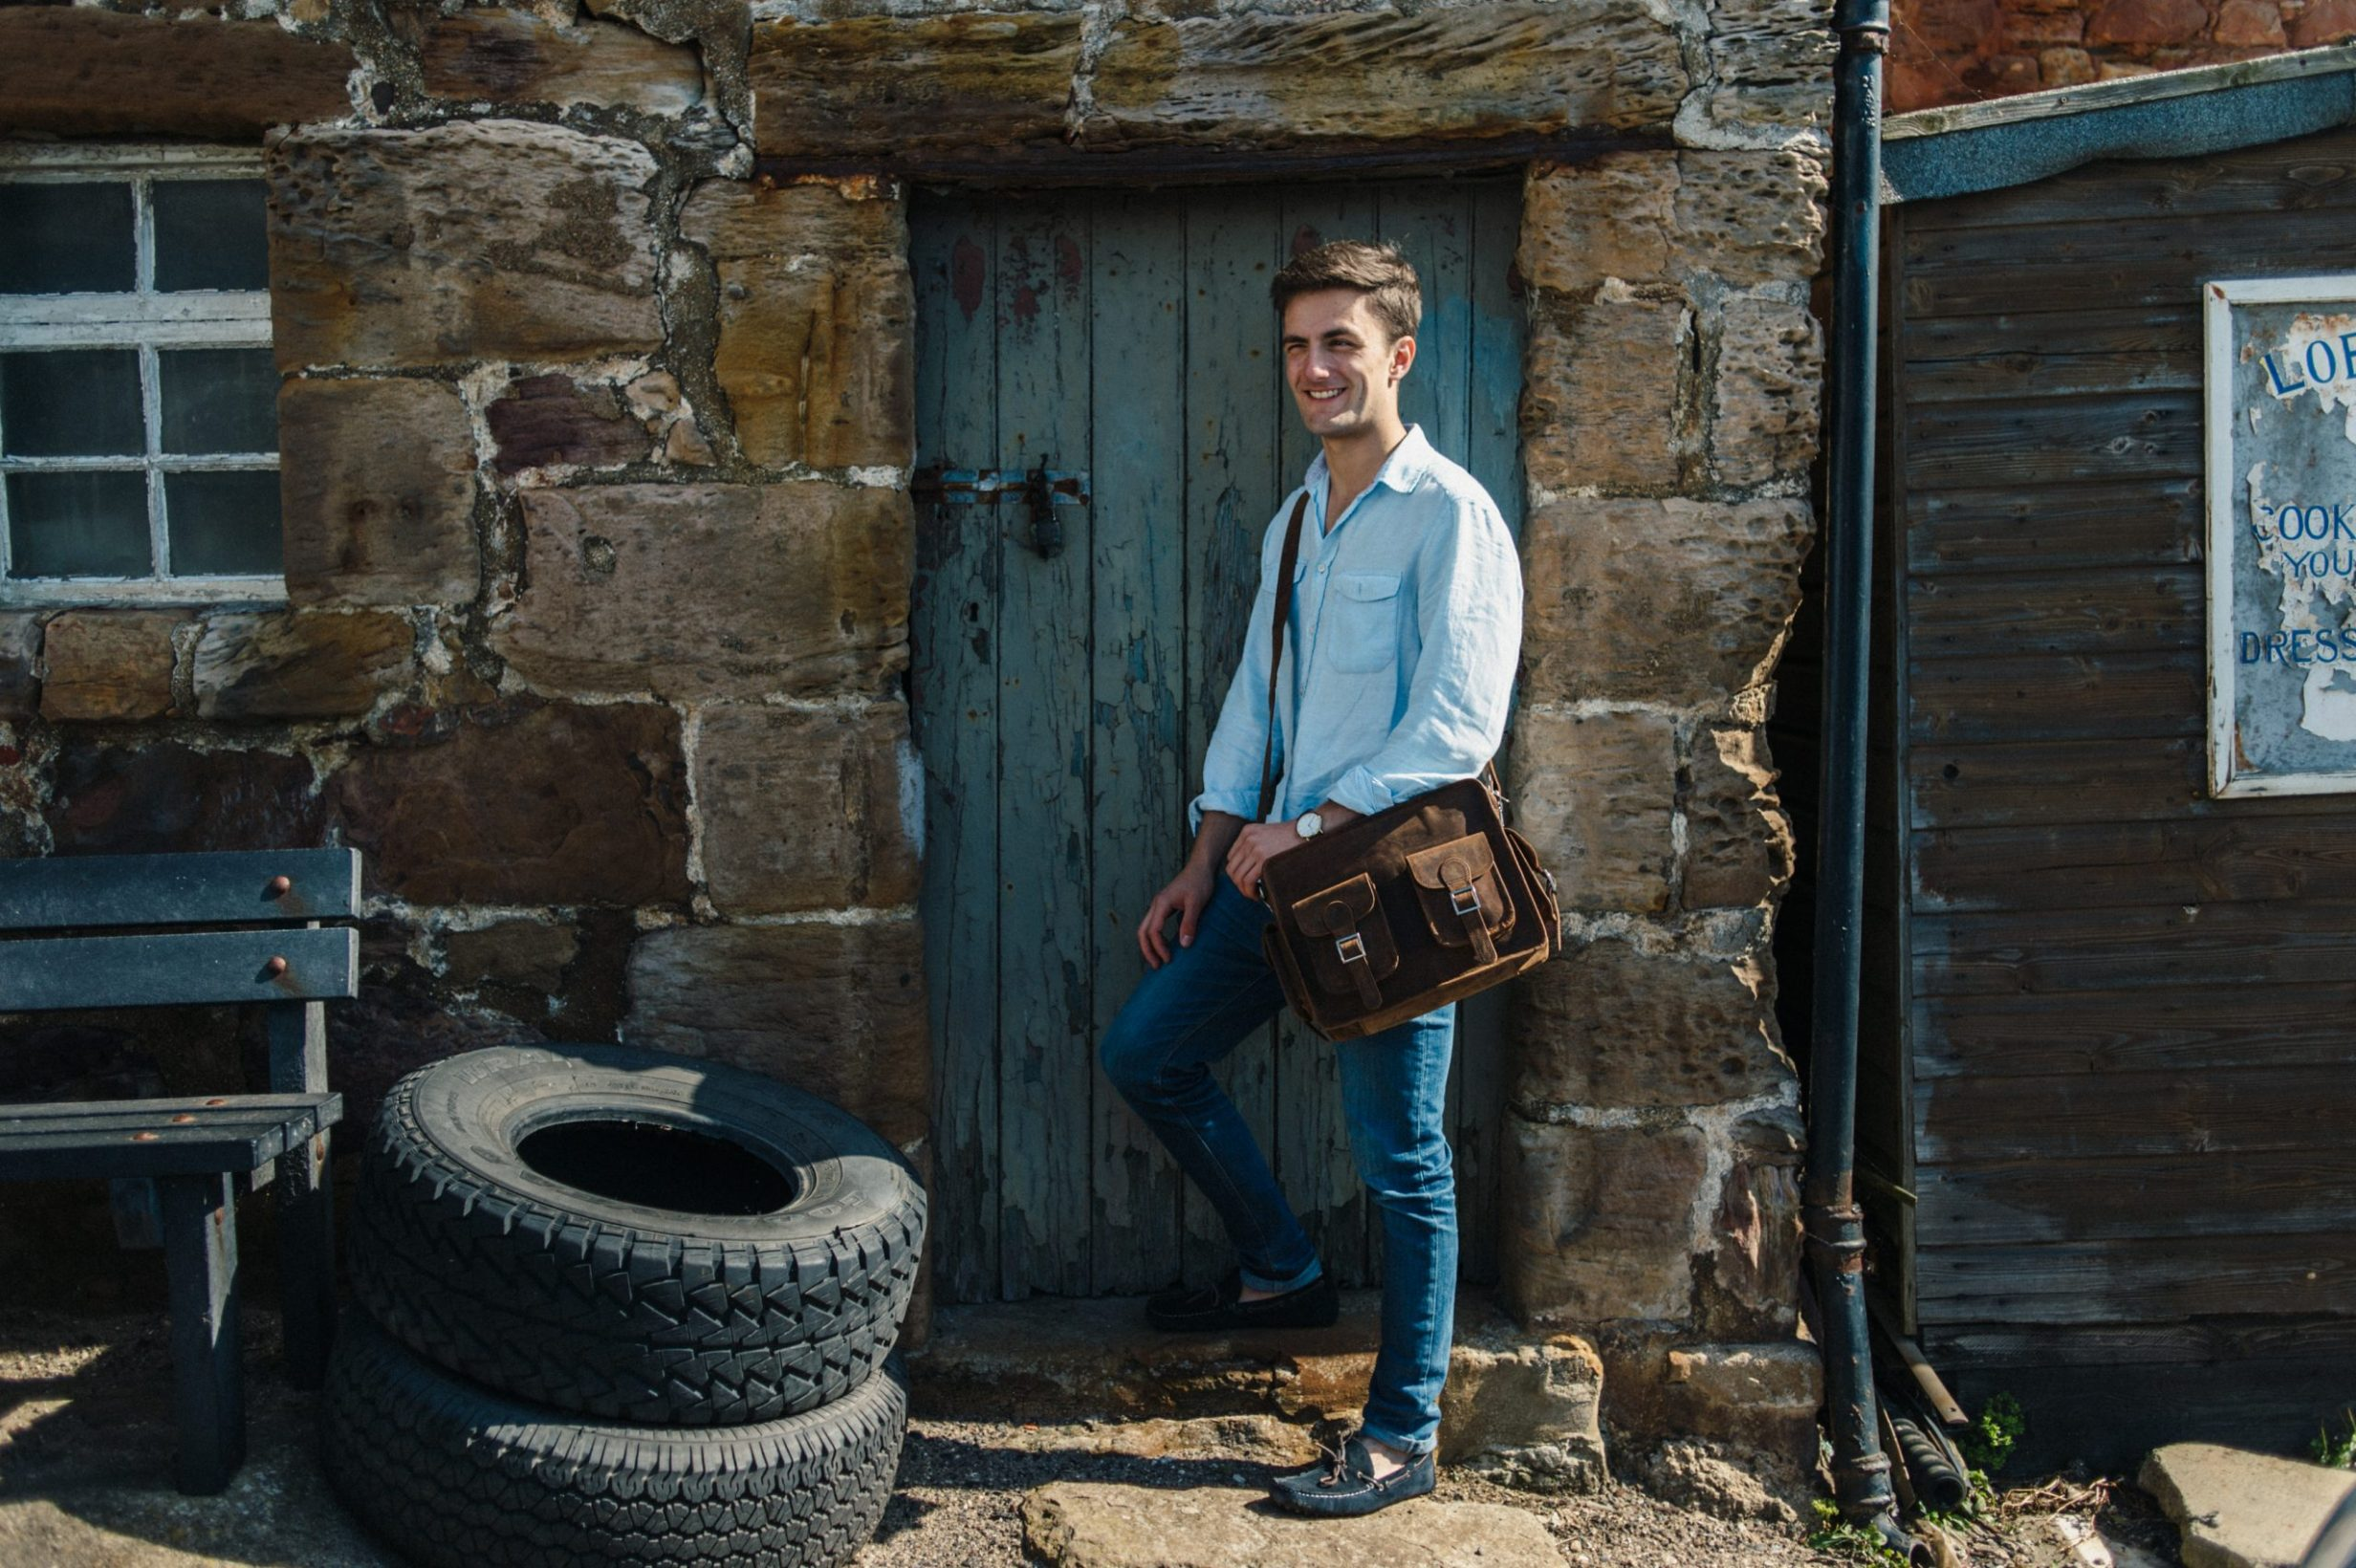 vintage leather bag, Fife, Scotland, Crail